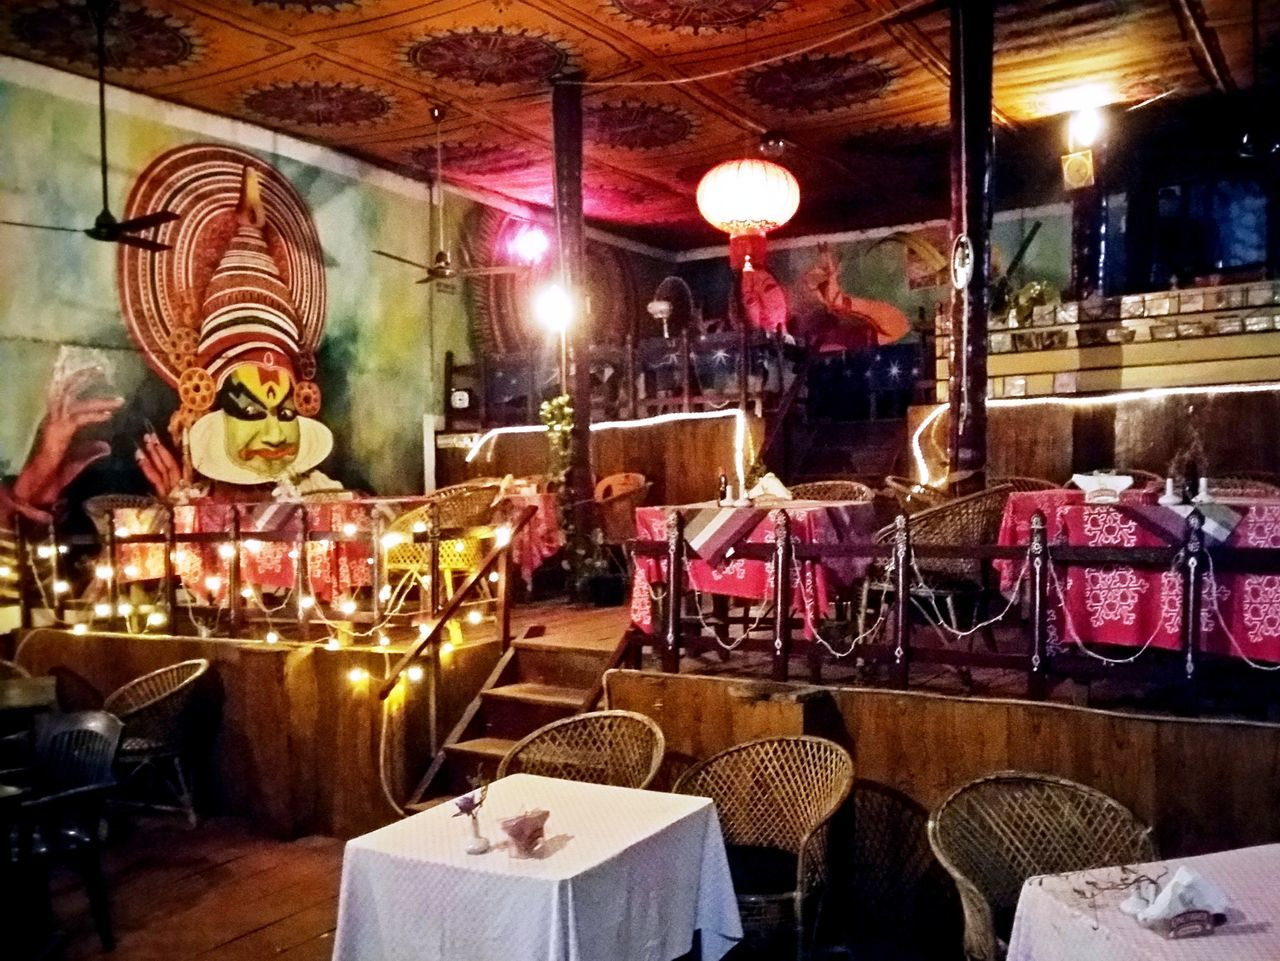 Varkalacliff Restaurant Decor Culture Kerala, India Hippielife Happie Place